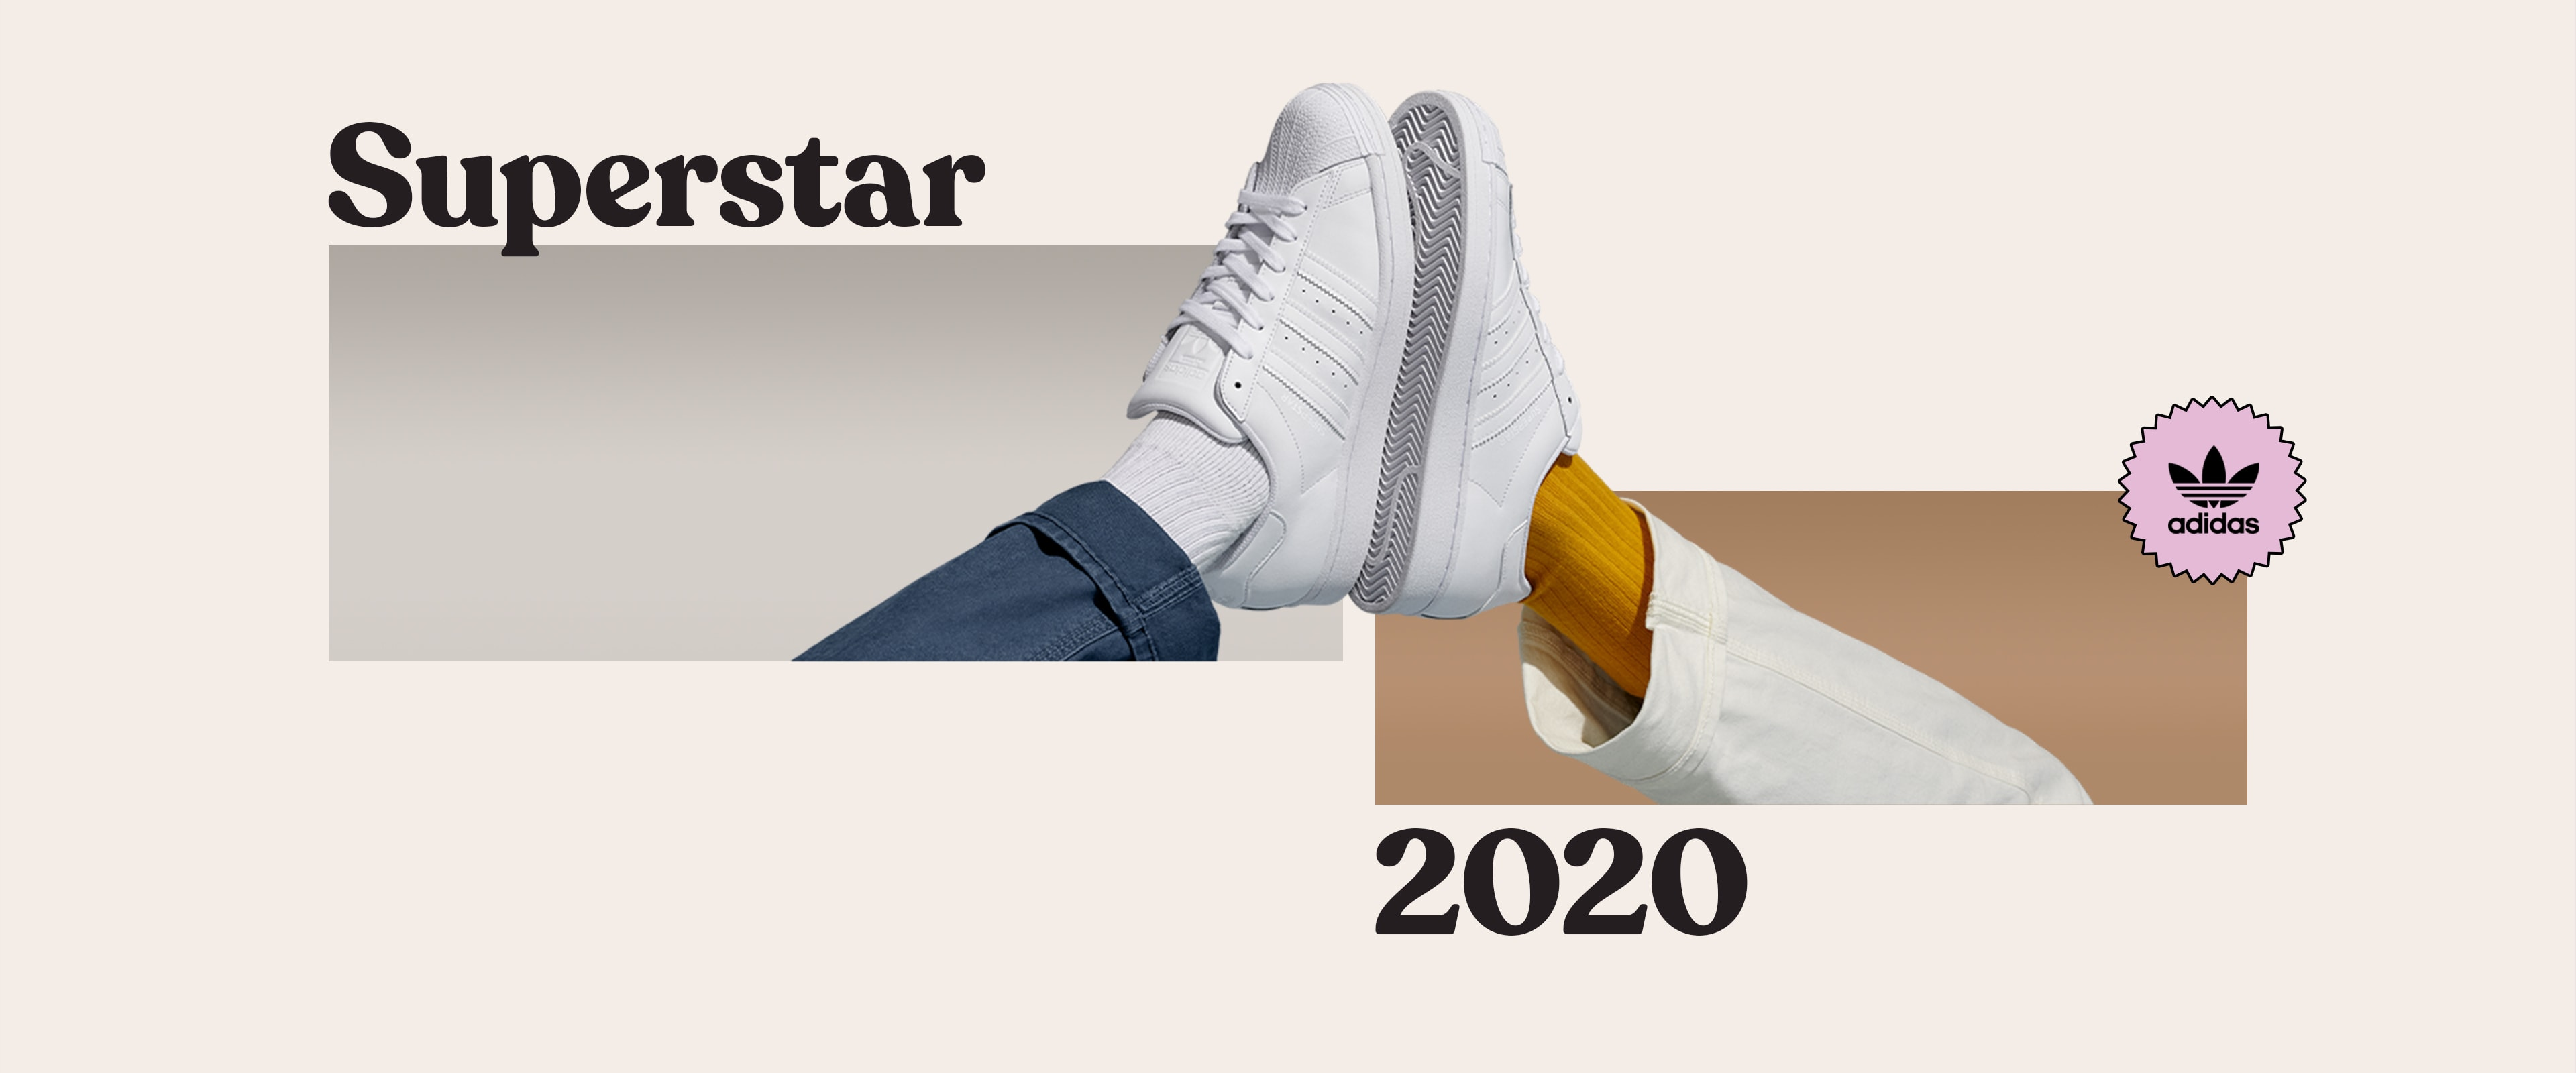 SUPERSTAR 2020 | adidas PT